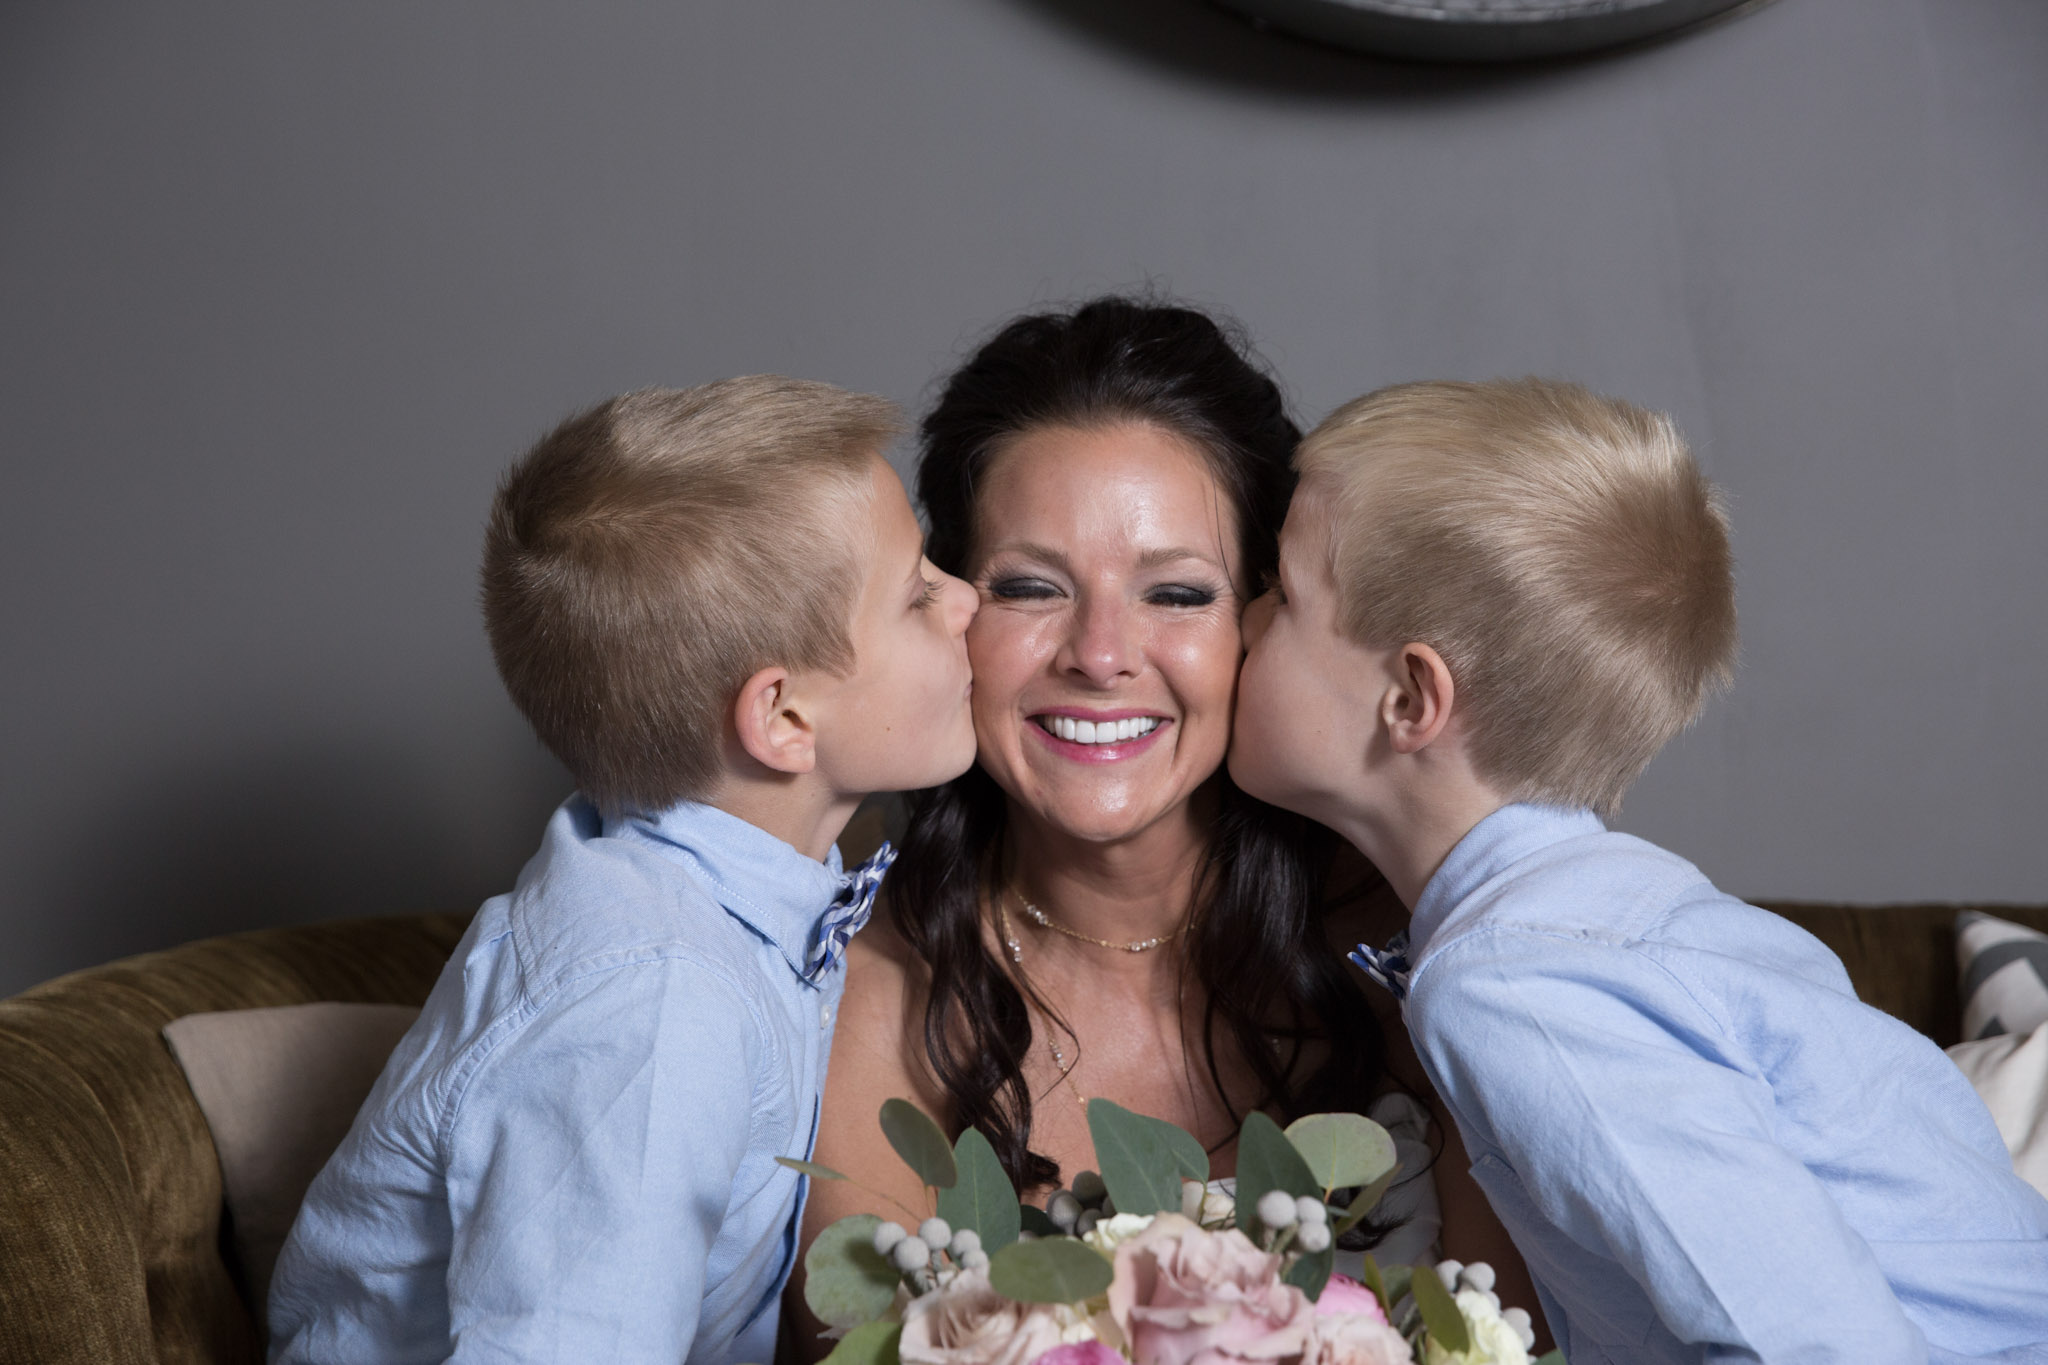 Kansas+City-Small+Wedding-Elope_Intimate_Ceremony_Mother's+Day21.jpg